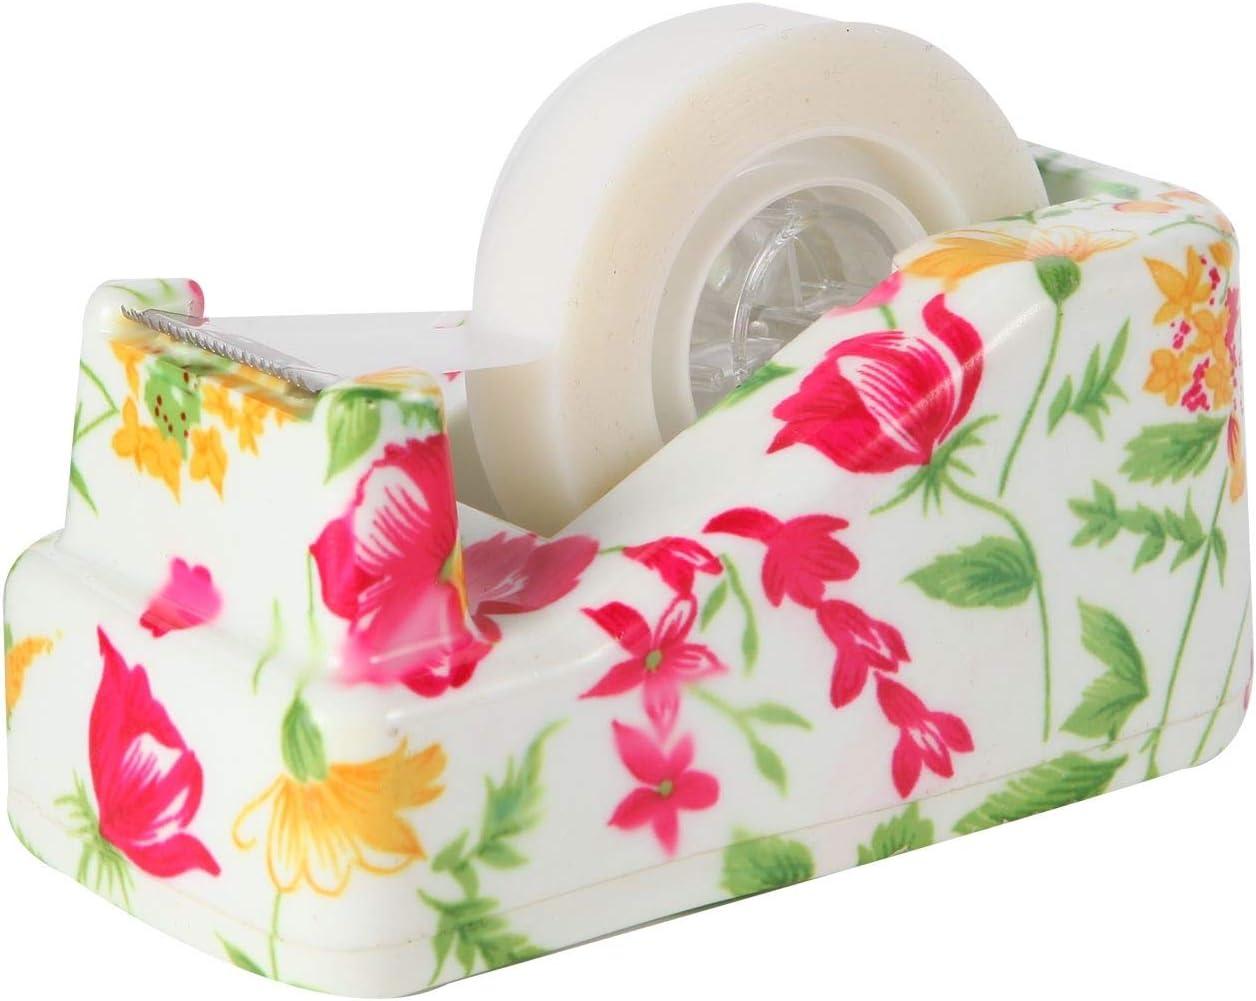 VIBRANZ-LAB Cute Tape Dispenser Desk Home F Arlington Free Shipping Cheap Bargain Gift Mall Office Supplies